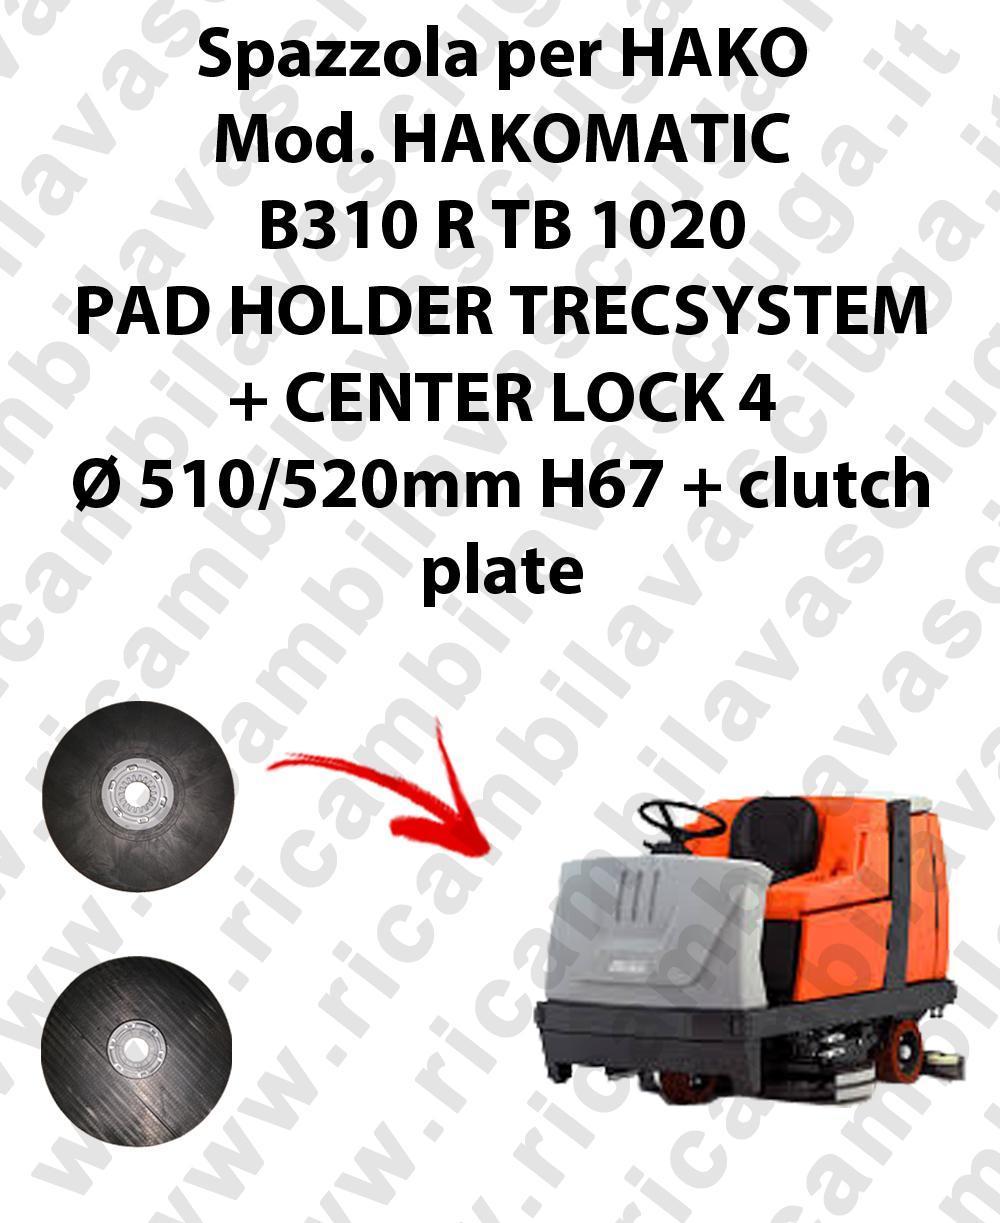 PAD HOLDER TRECSYSTEM  para fregadora HAKO modelo HAKOMATIC B310 R TB 1020